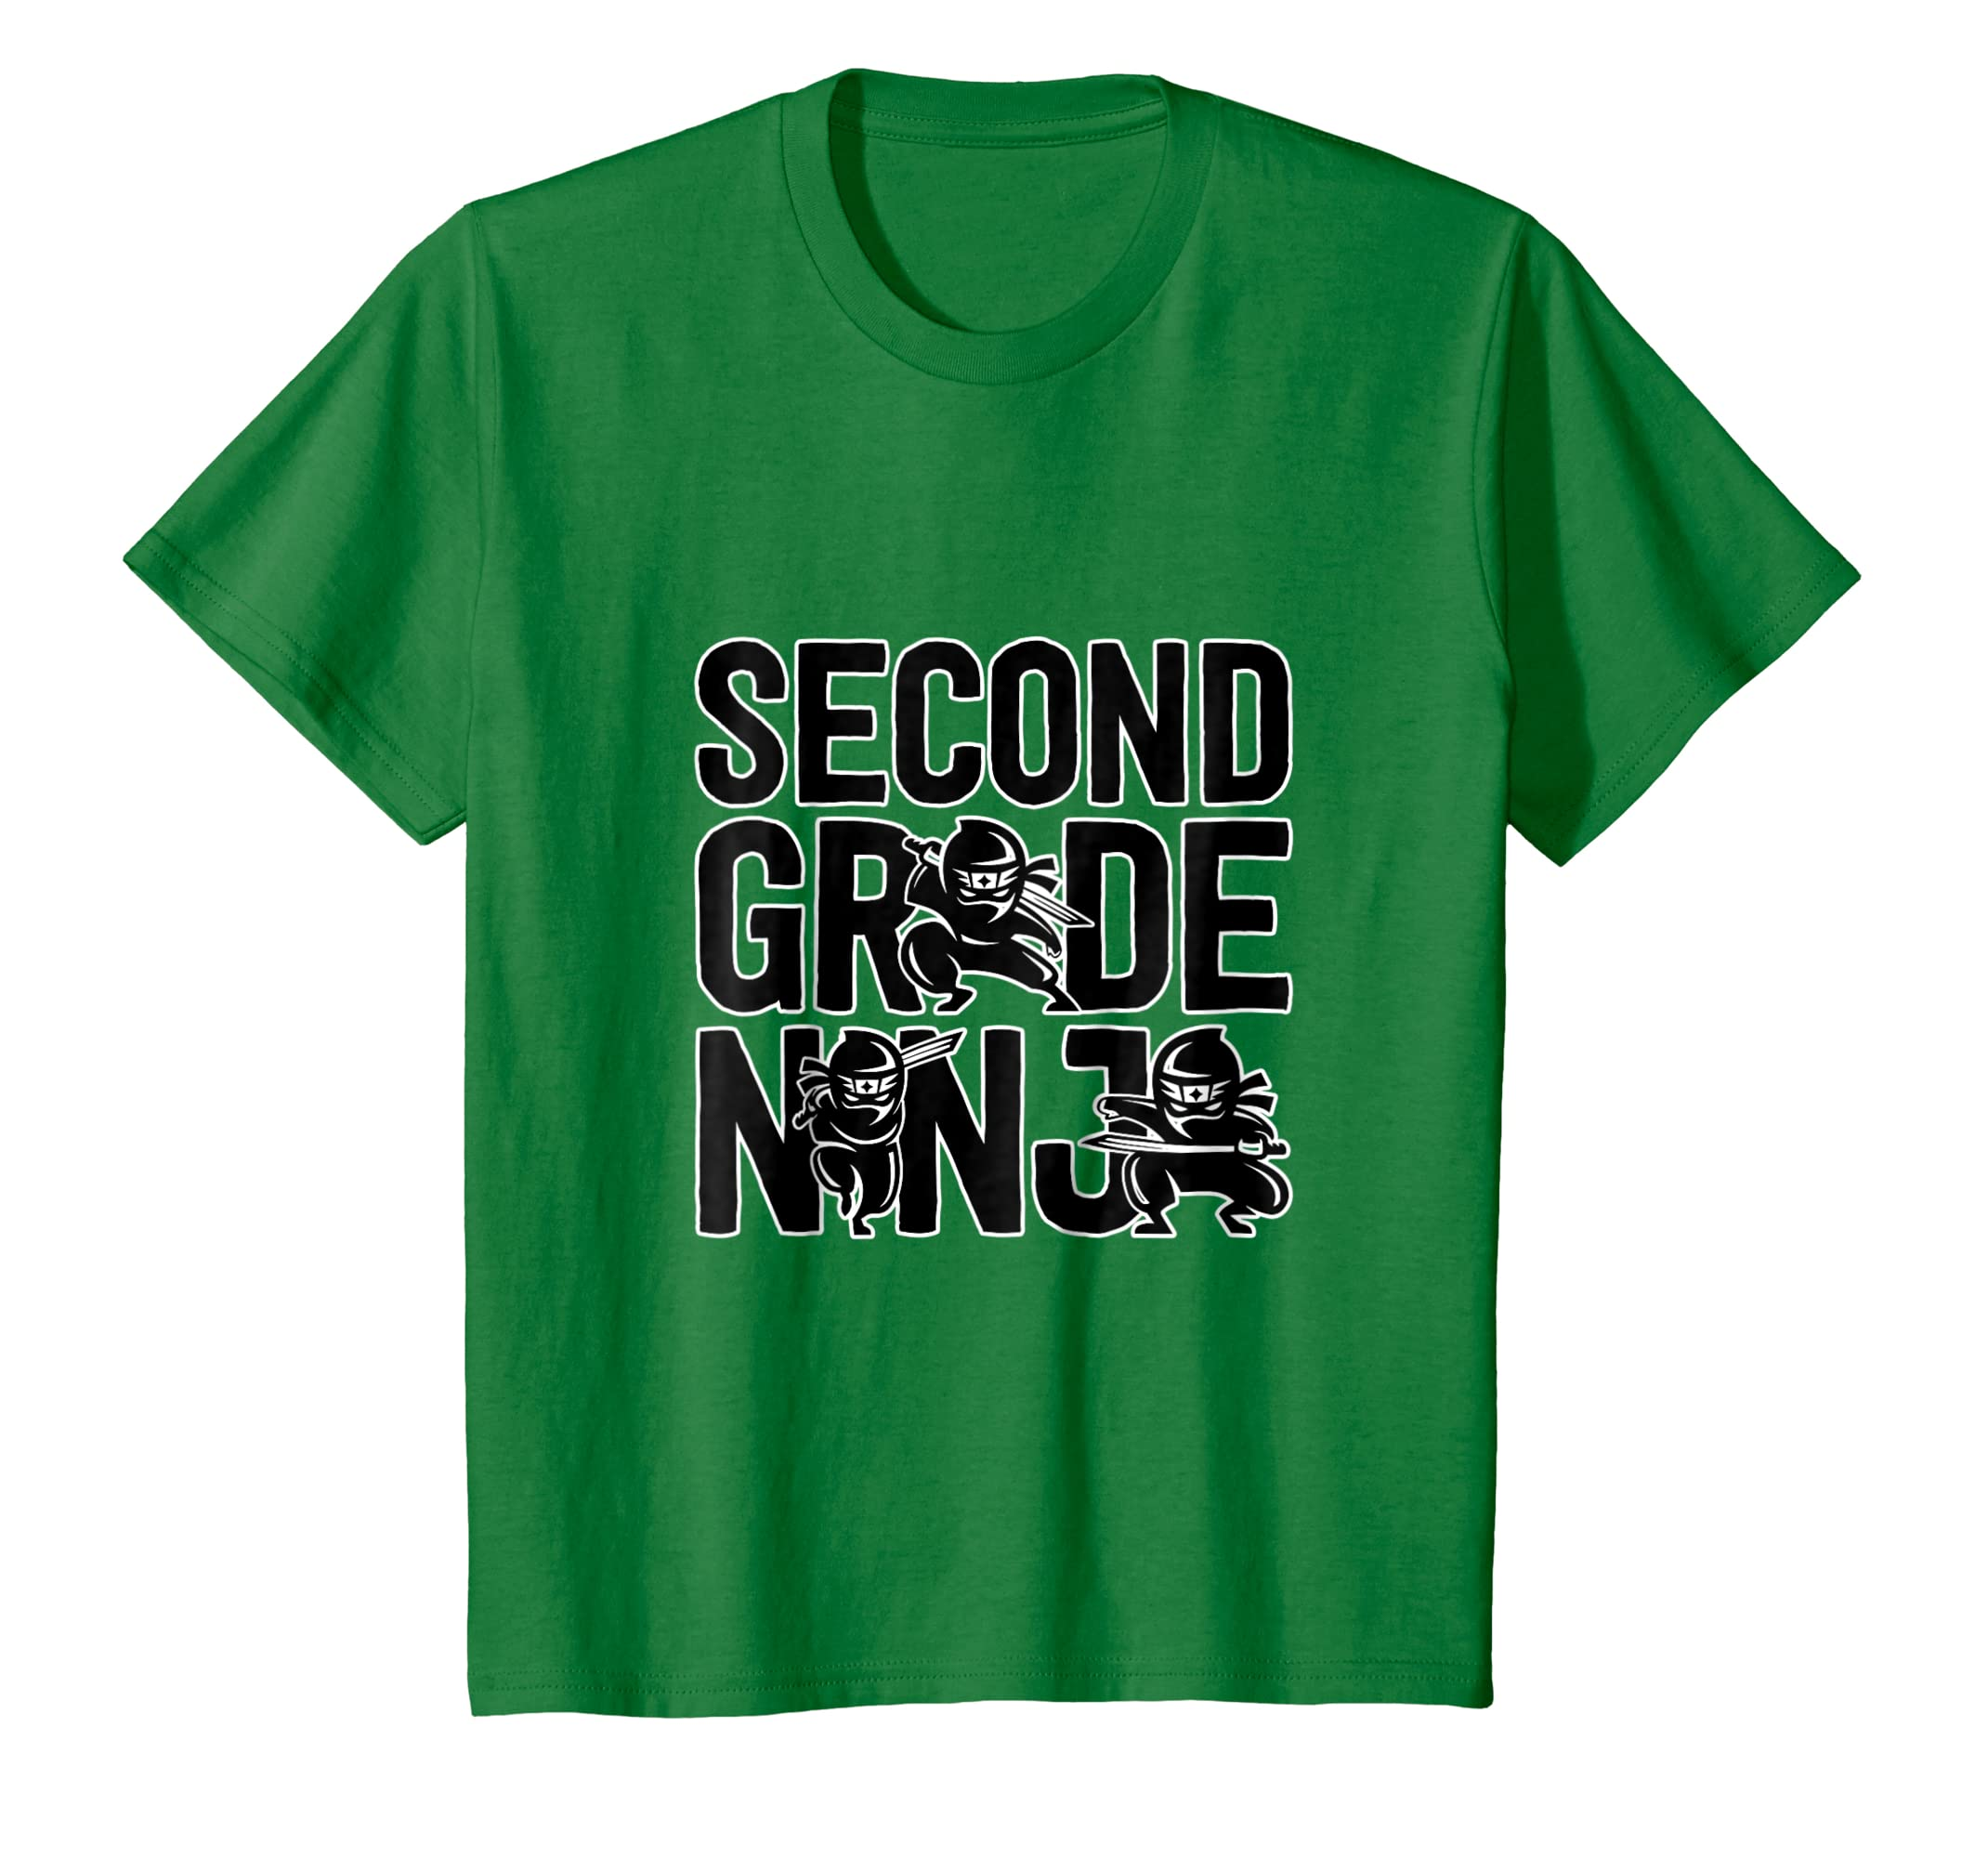 2nd Grade Tshirt Second Grade Ninja Boys Back to School Tee-Awarplus